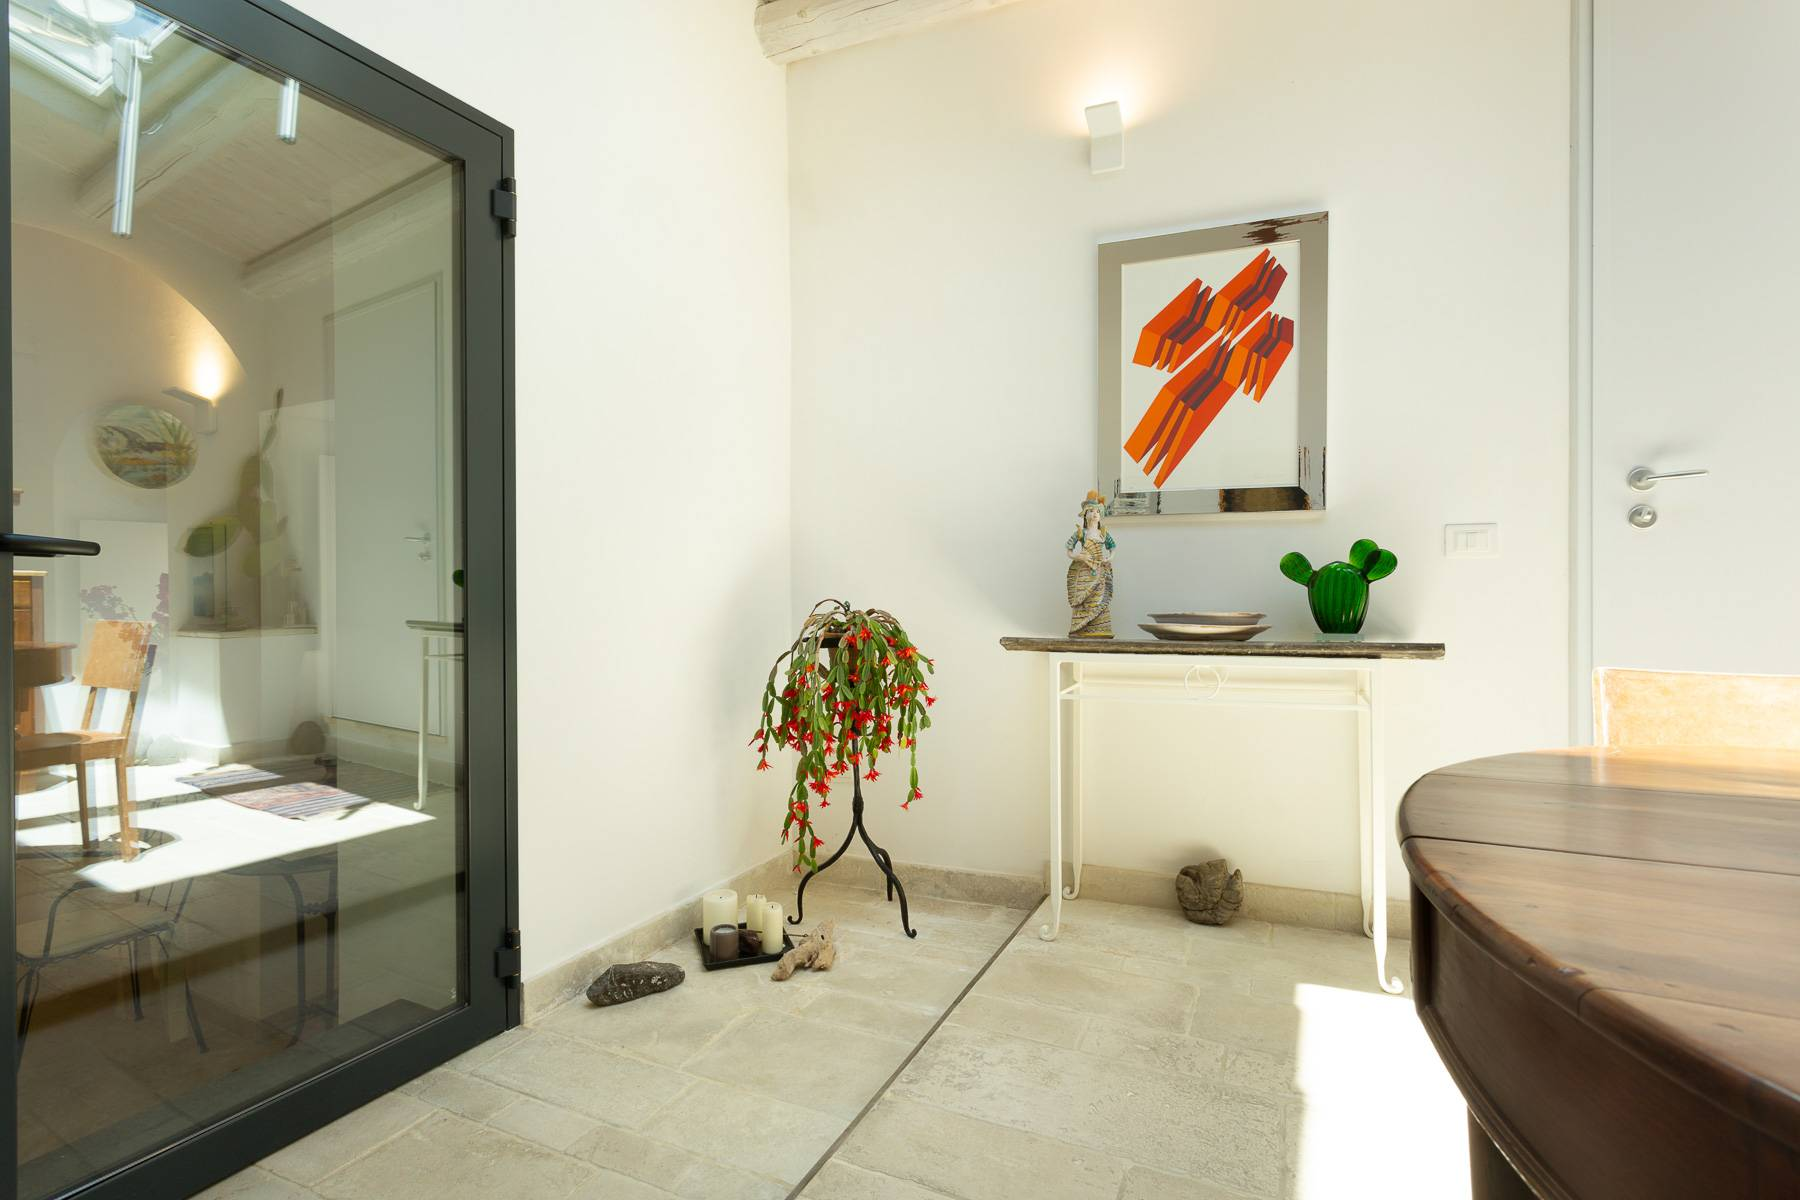 Casa indipendente in Vendita a Noto: 5 locali, 171 mq - Foto 16